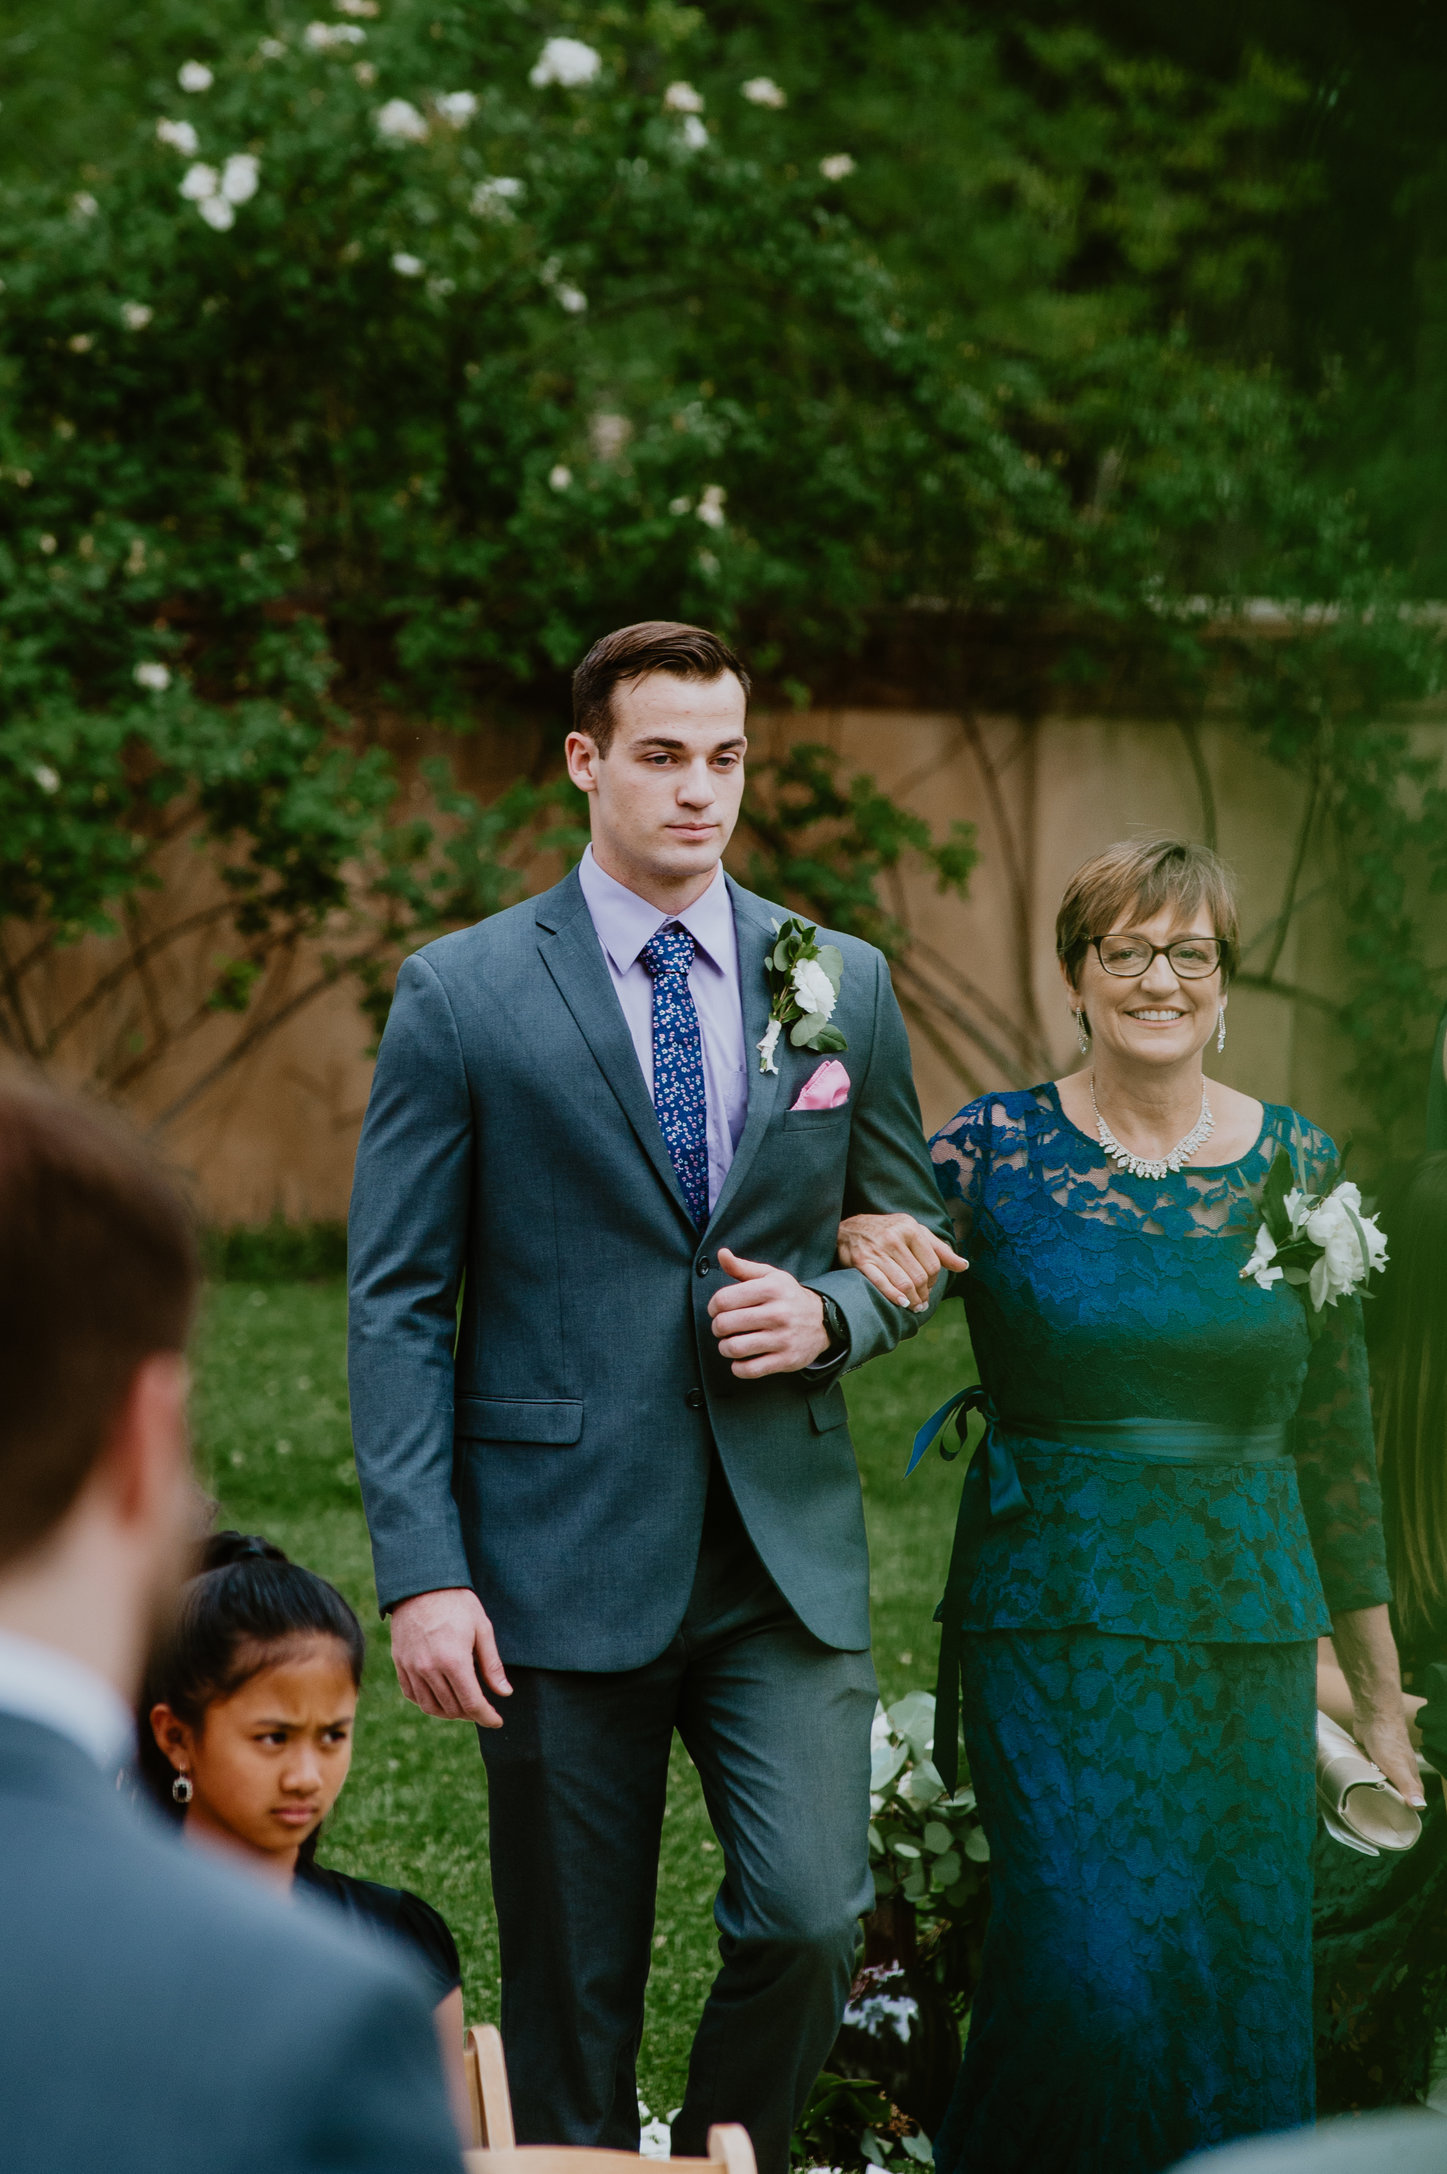 DandA-wedding-216.jpg